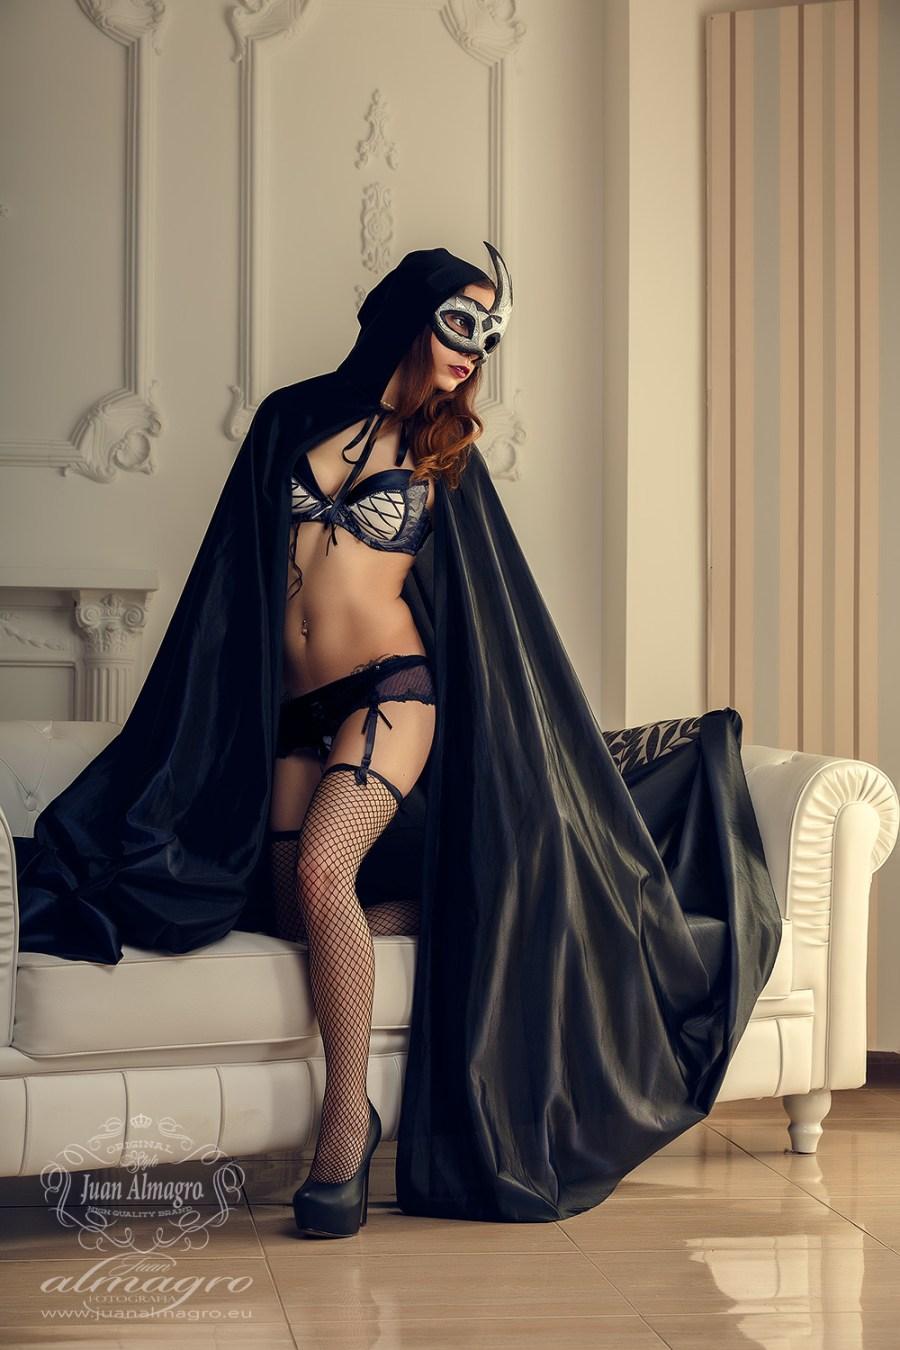 Fotografia Boudoir, fotografia sexy y glamour por Juan Almagro Fotografos Jaén